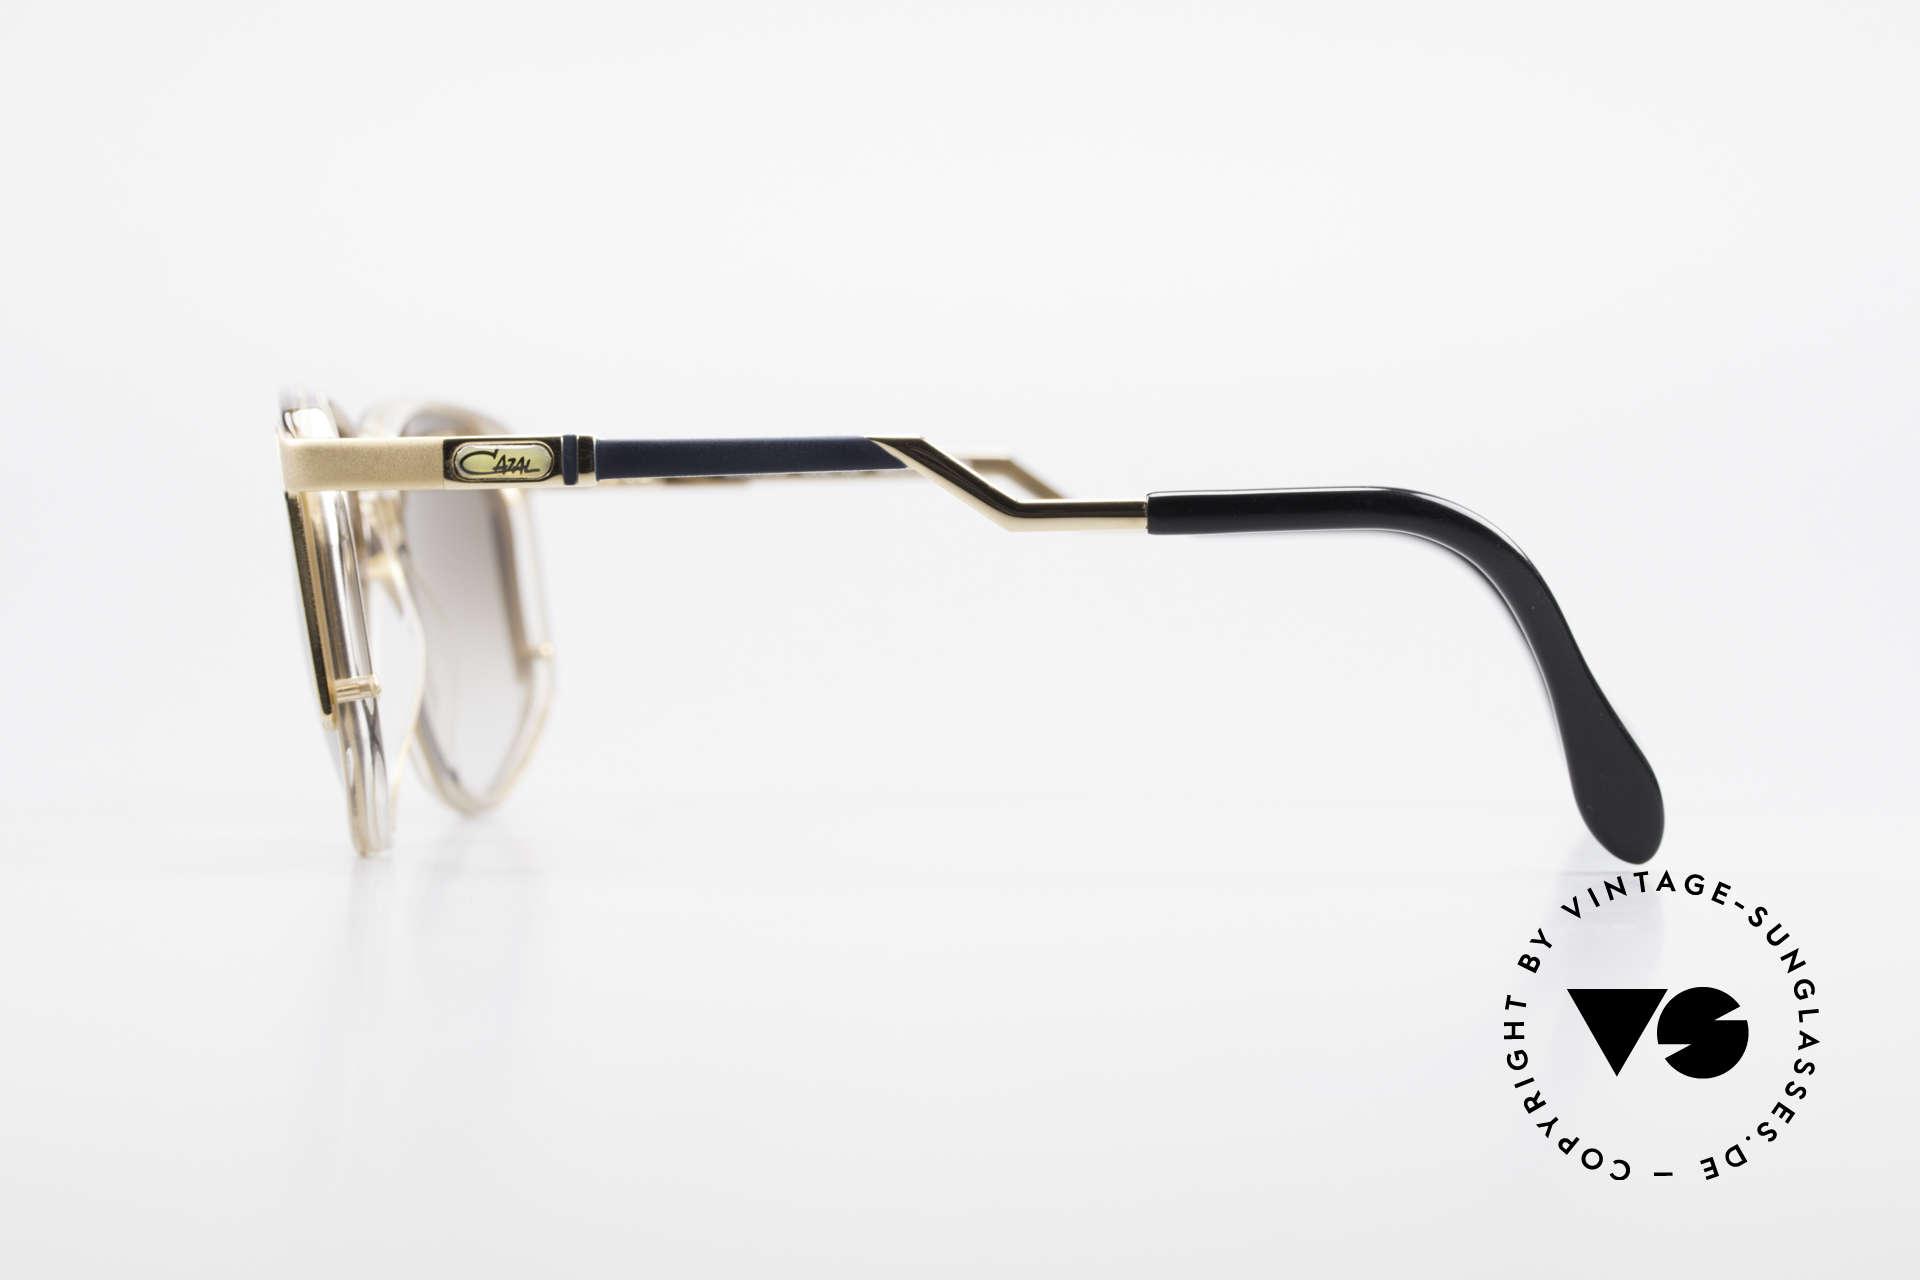 Cazal 346 Hip Hop Designer Sunglasses, never worn (like all of our vintage Cazal sunglasses), Made for Men and Women